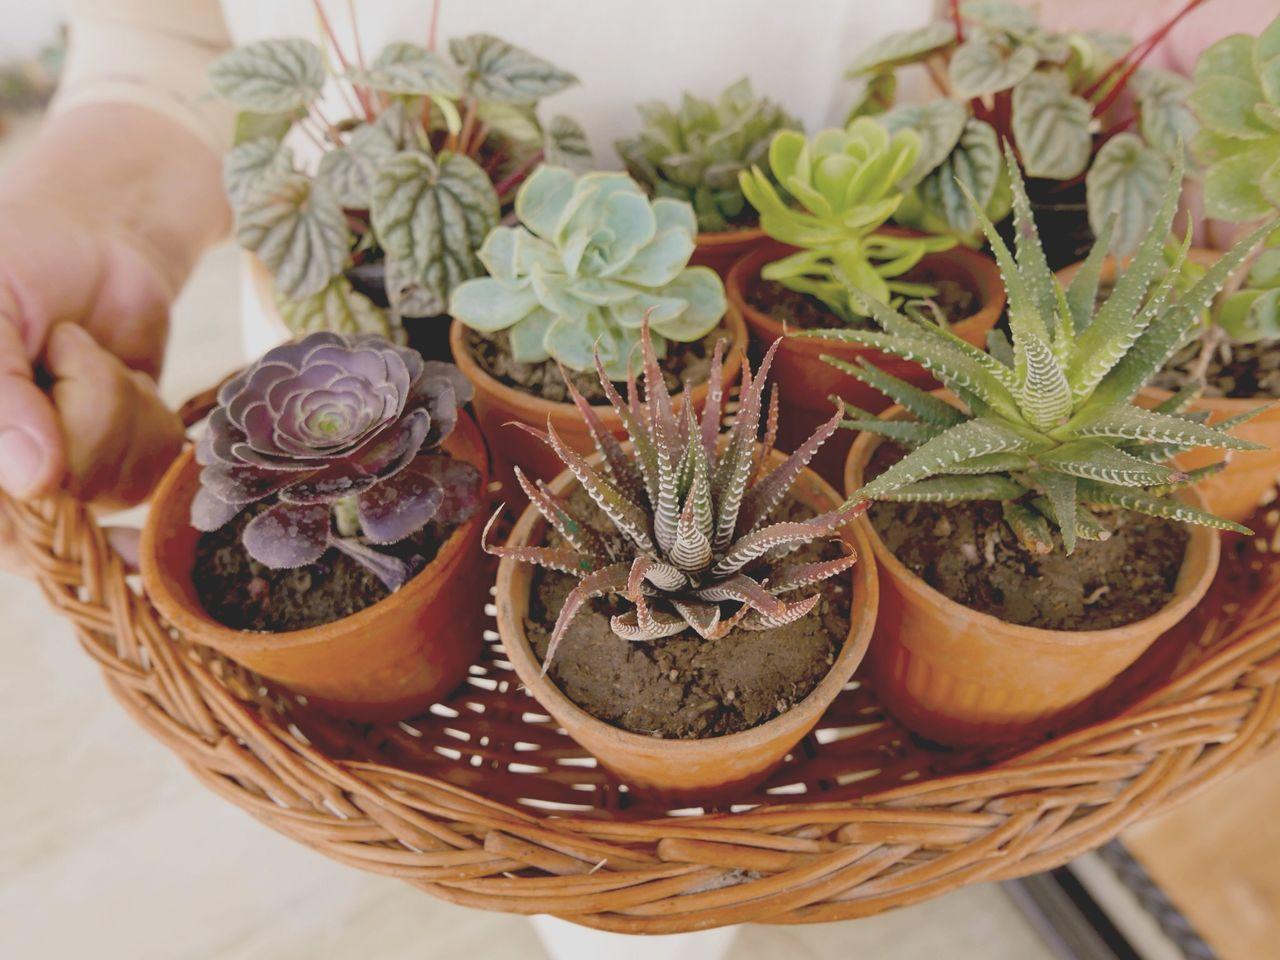 winter gardening Succulents Cactus Gardening My Little Garden Grow Urban Gardening Winter Garden Leica D-lux Typ109